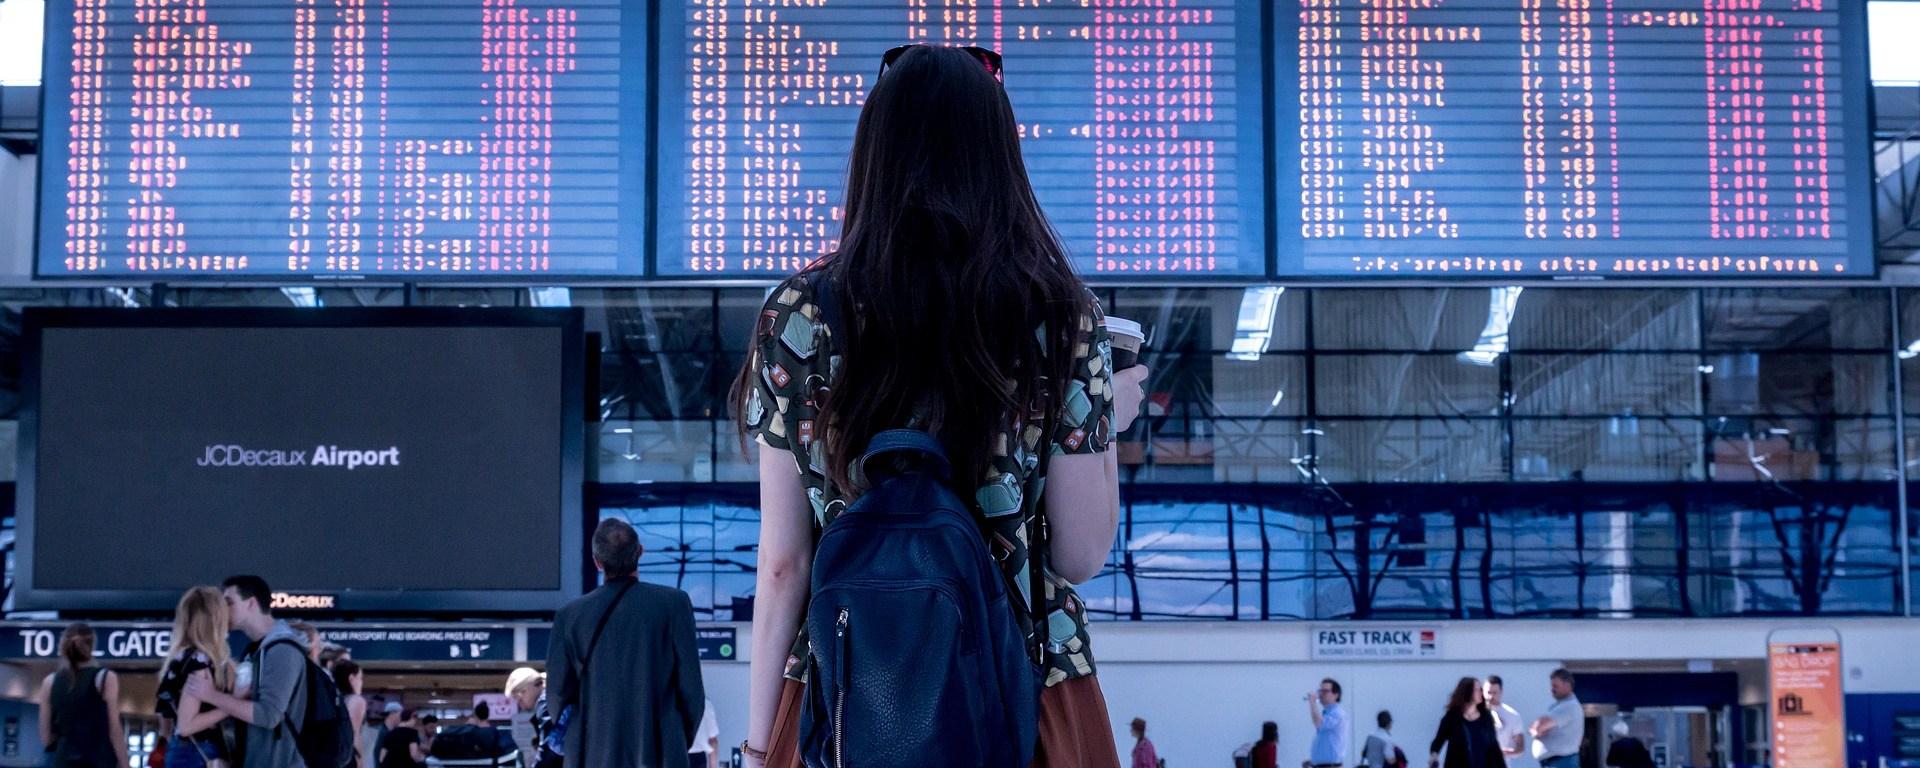 airport-transit